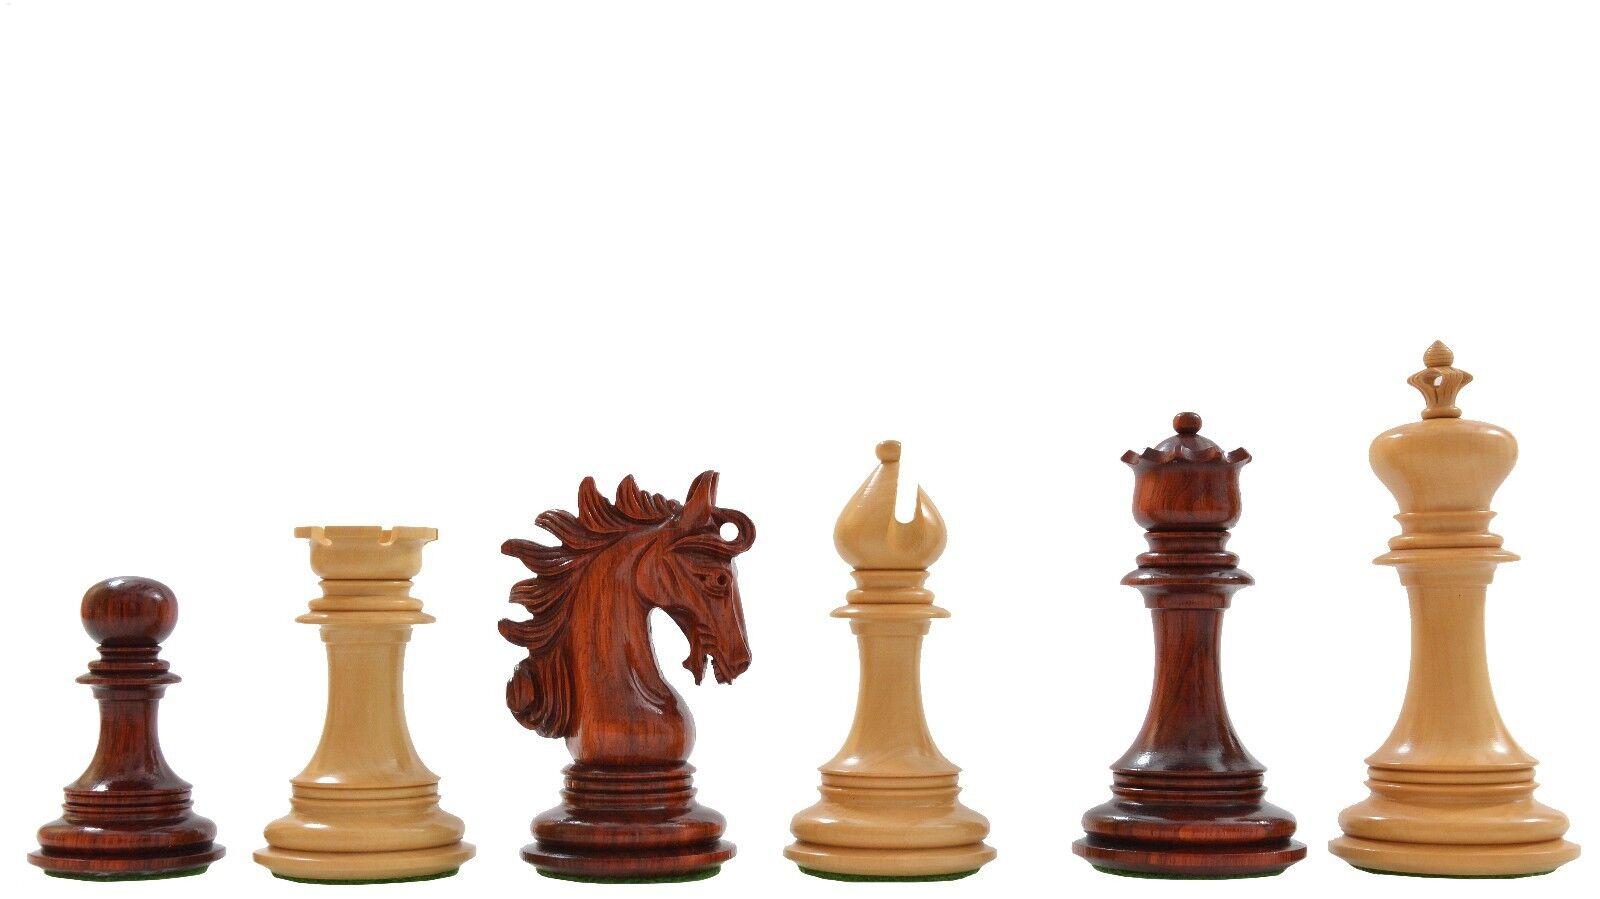 The Arabian Knight Artisan Staunton Chess Pieces in Bud pink & Box Wood